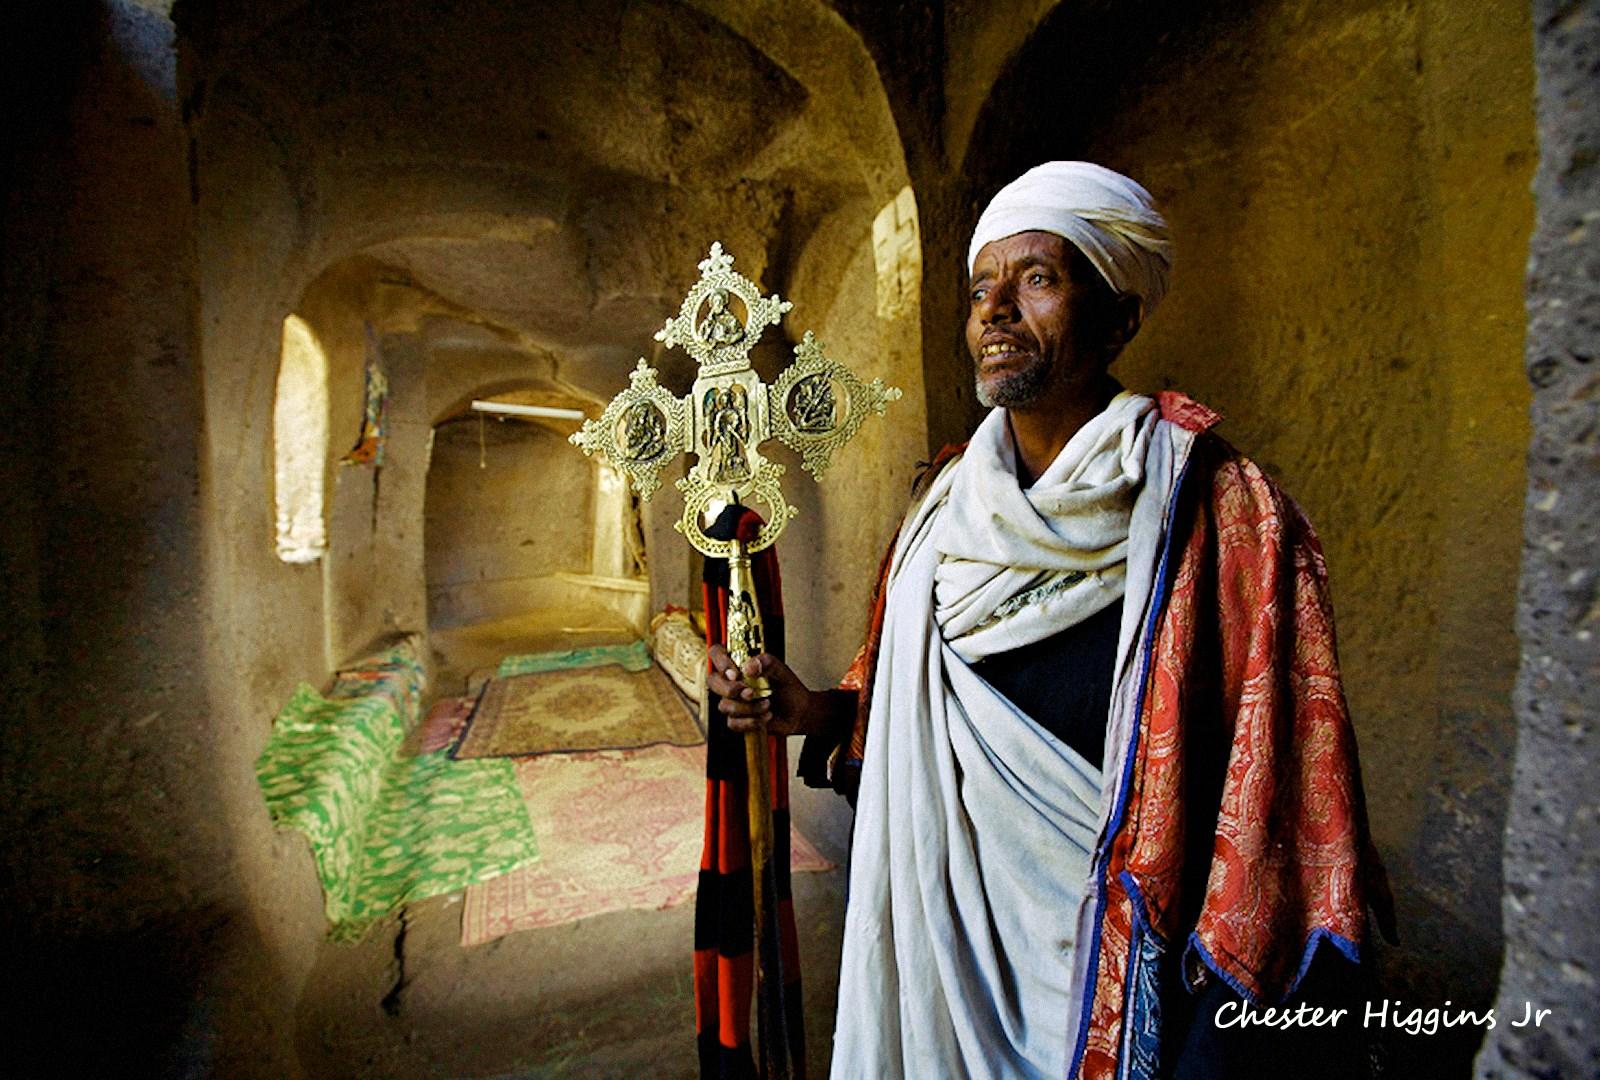 00 Chester Higgins. Lalibela. Asfa Mariam Church. Ethiopia 01. 06.06.15